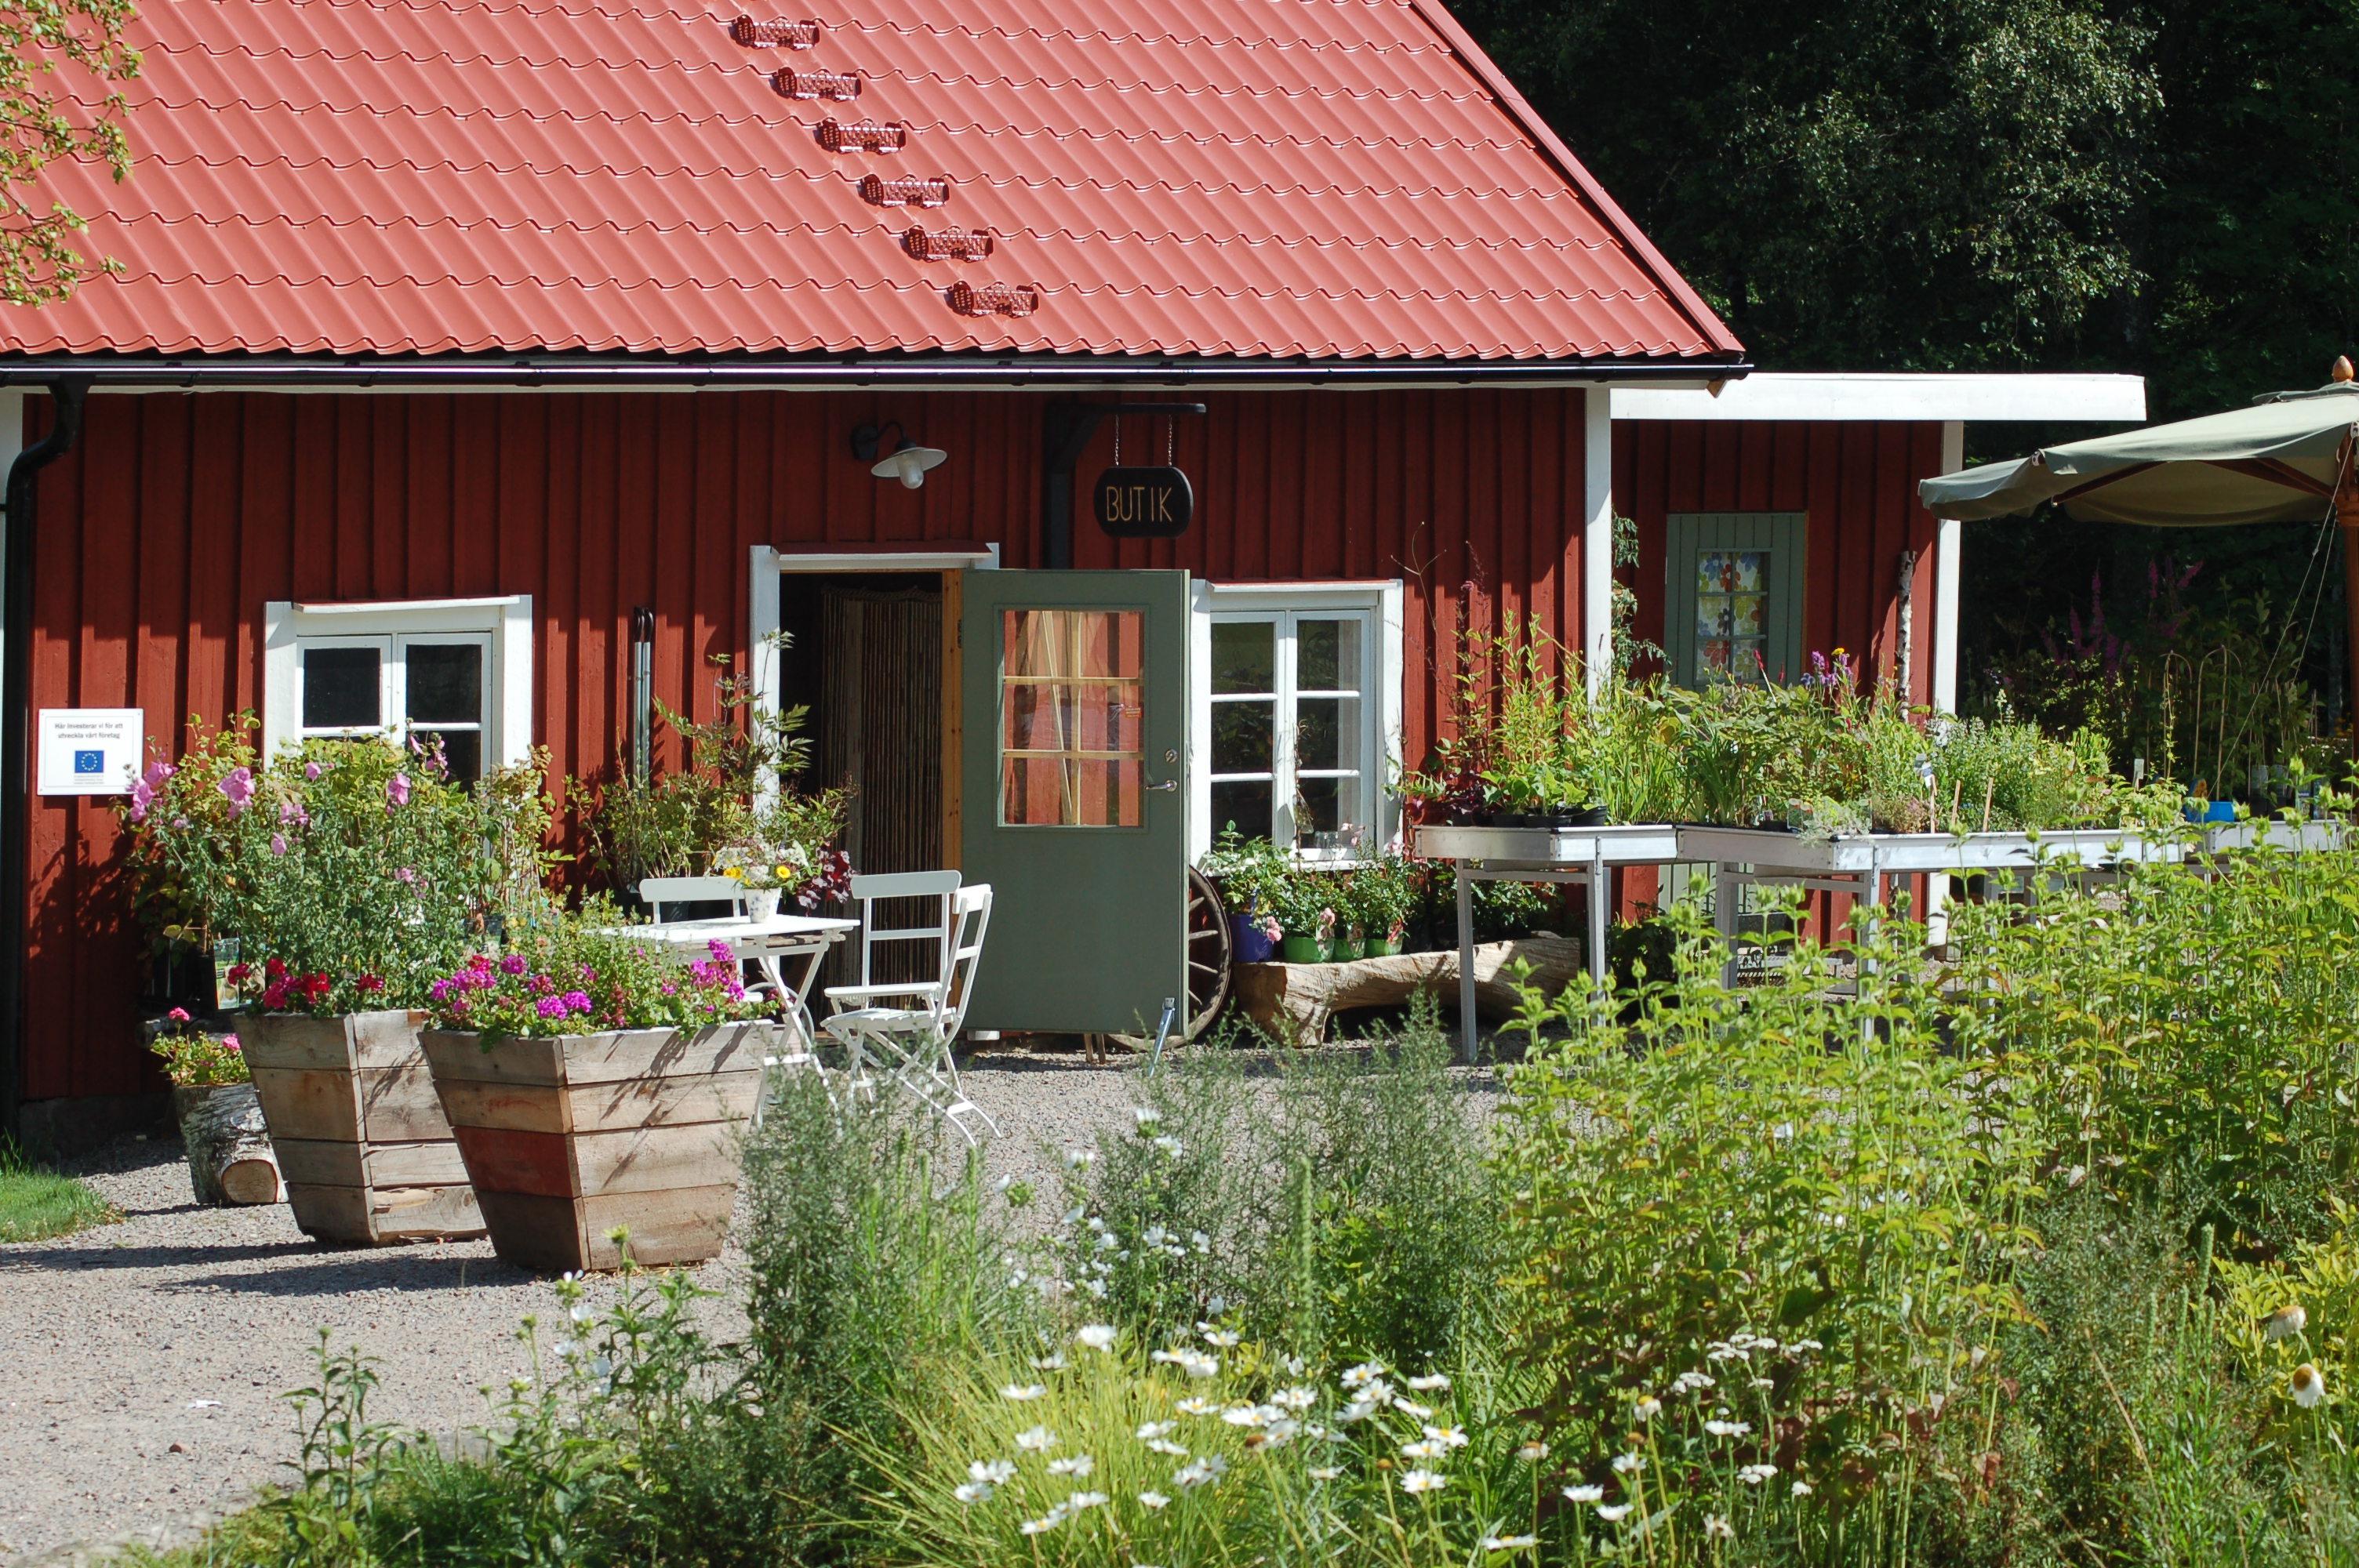 trädgårdsbutik